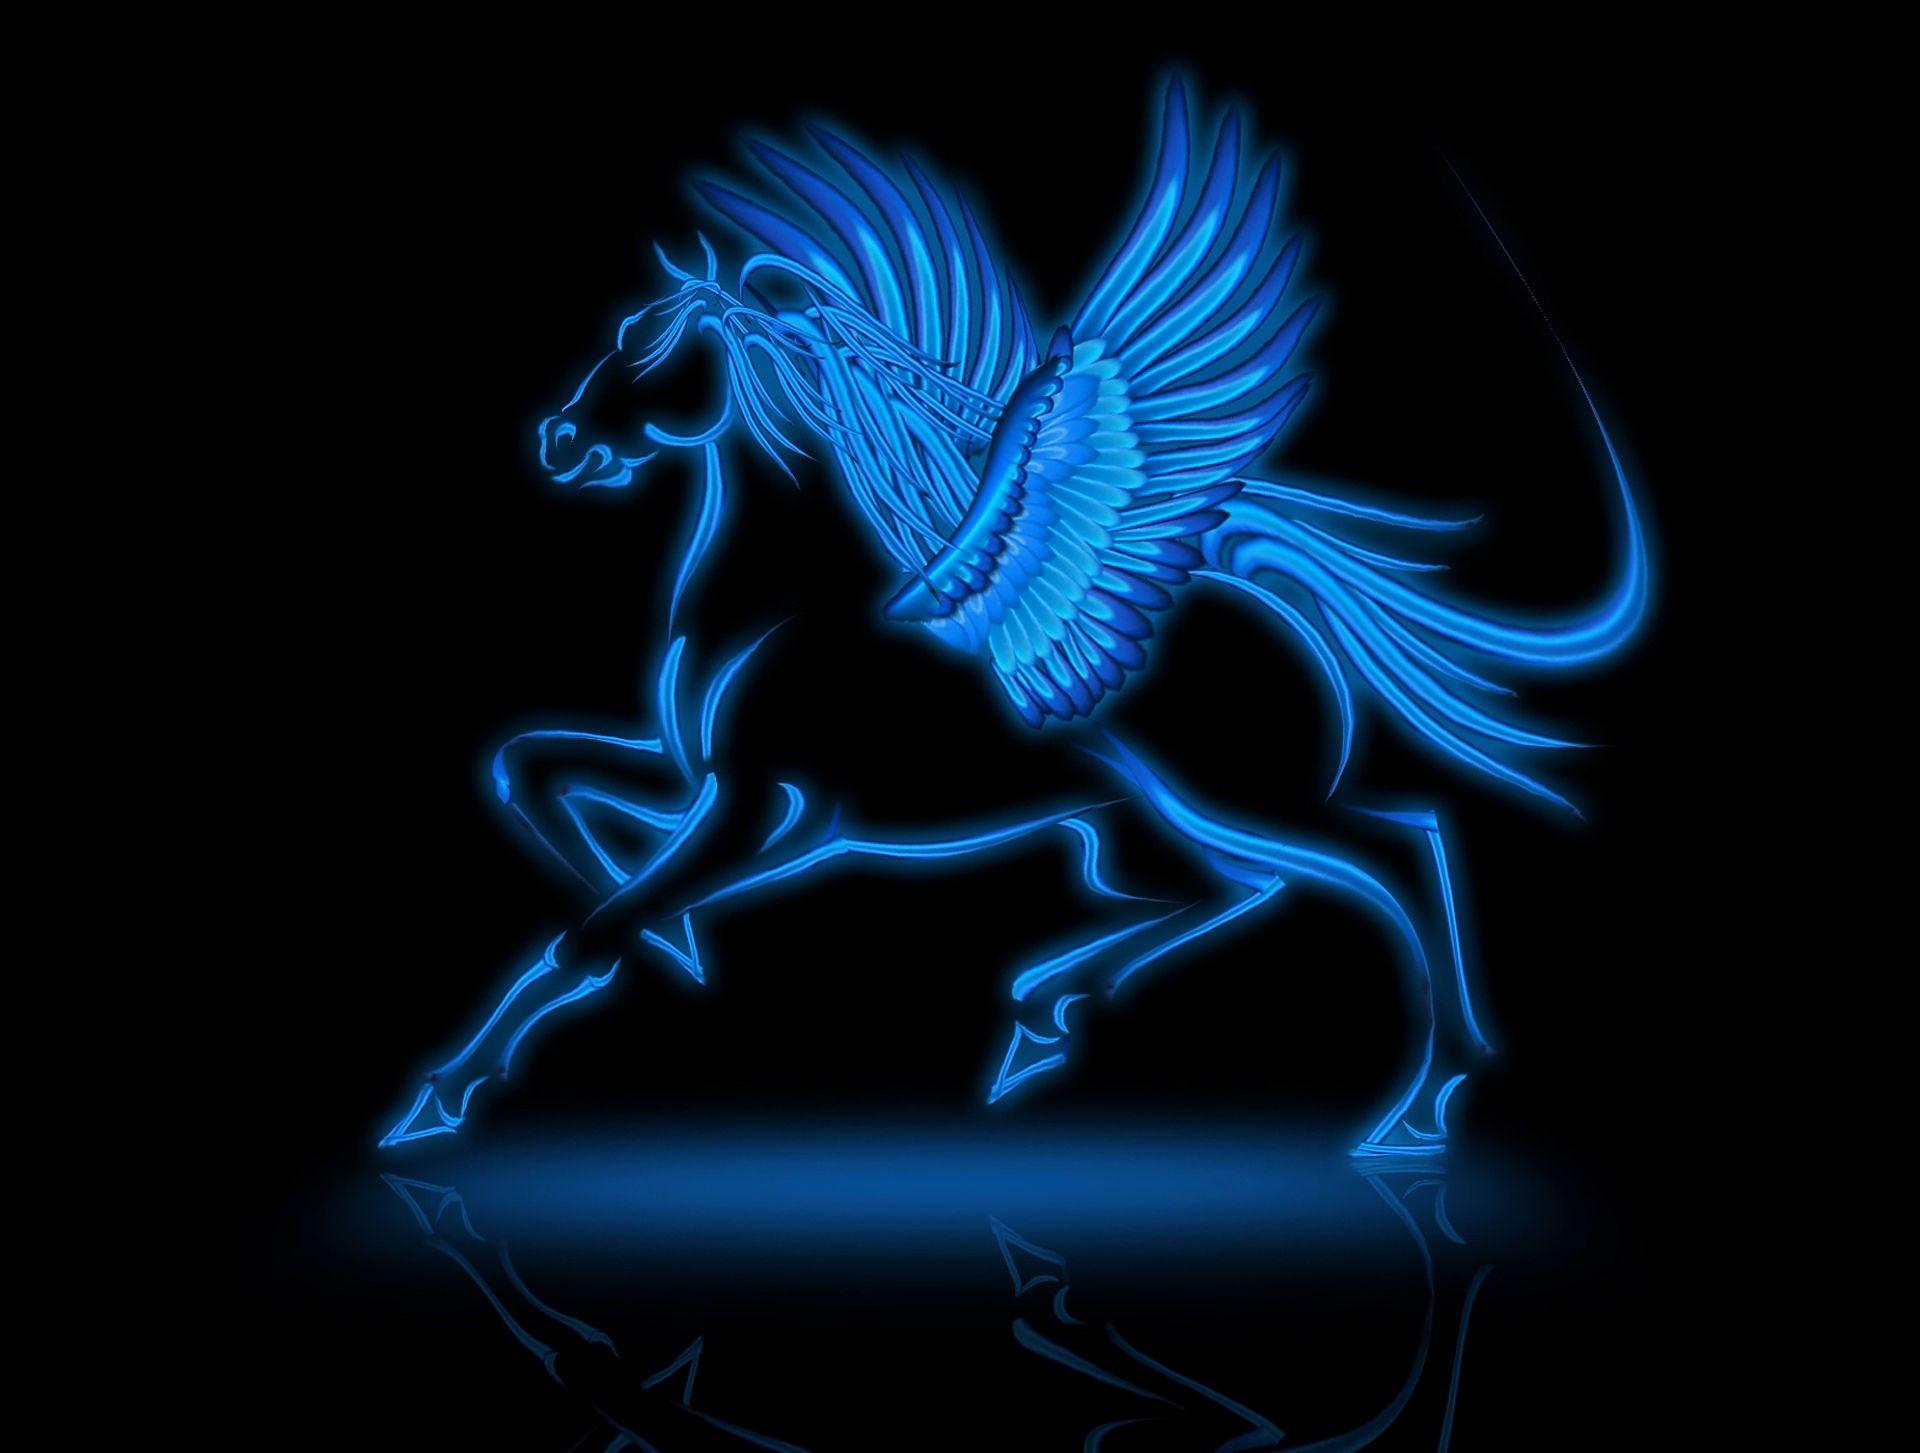 Blue Fire Horse Wallpaper - Blue Pegasus Wallpaper Hd , HD Wallpaper & Backgrounds